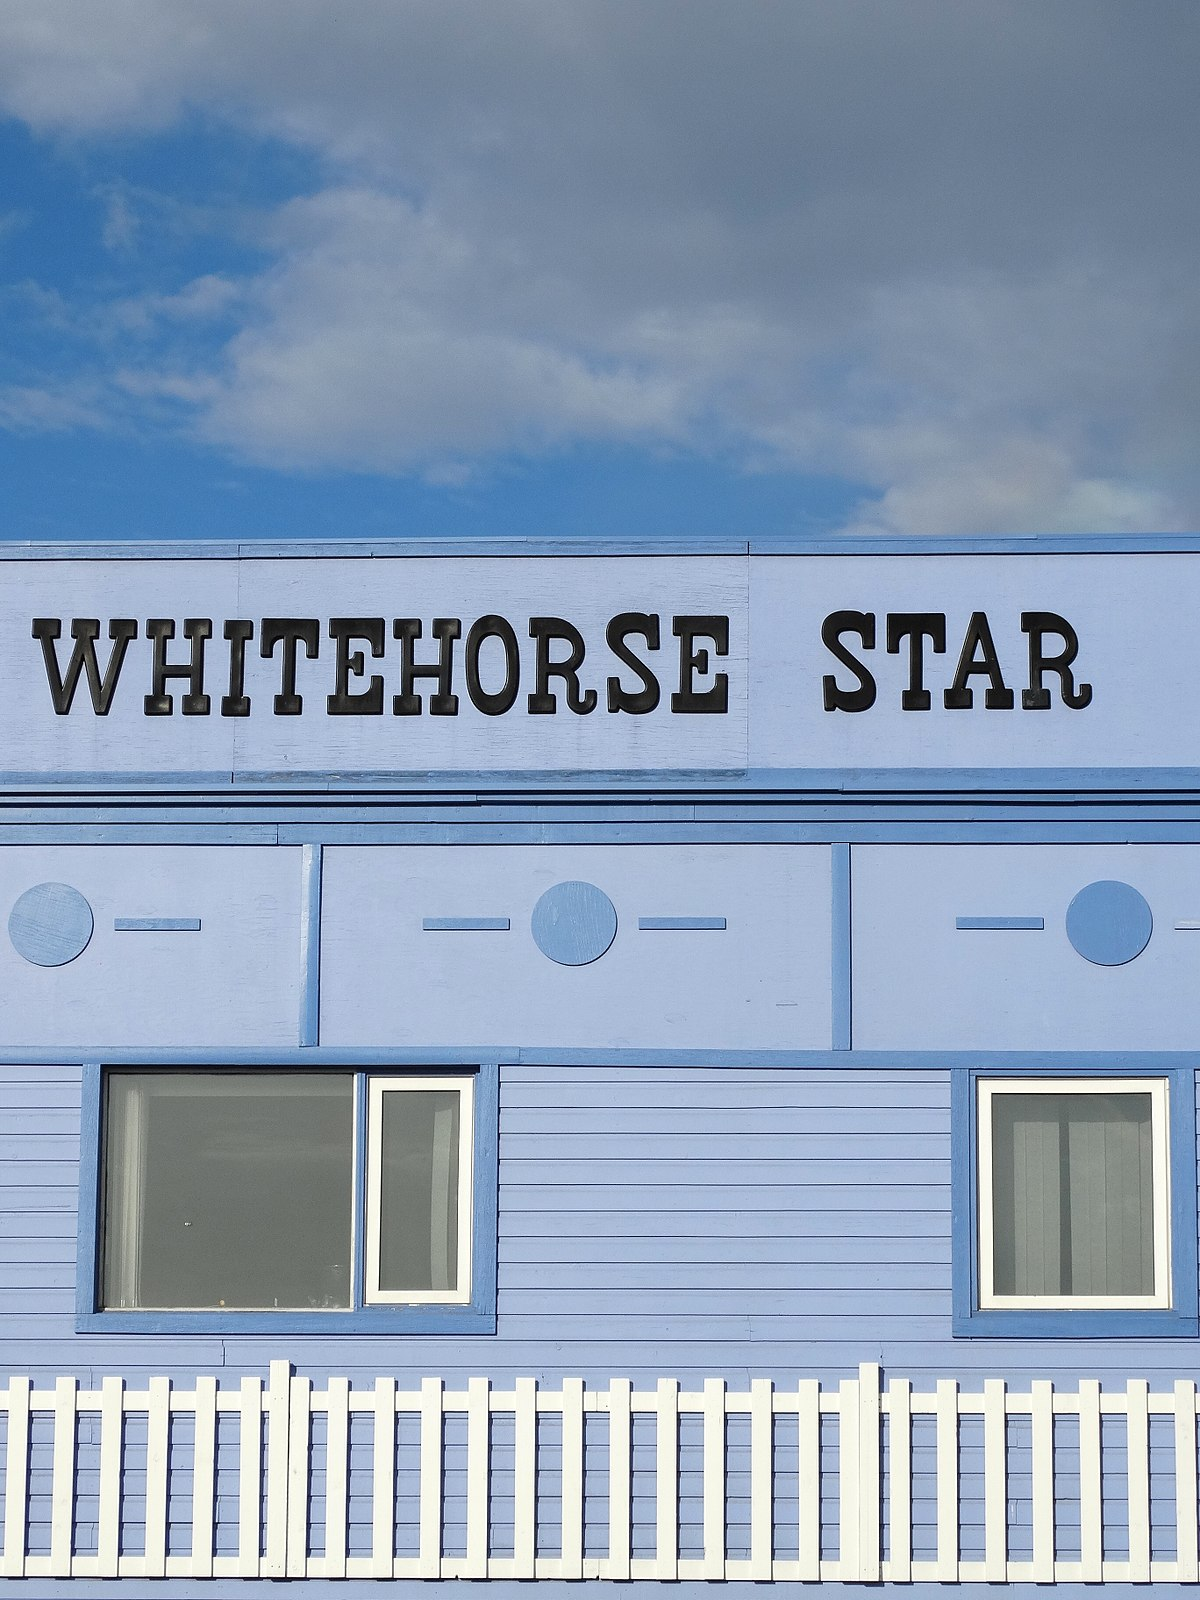 File Facade Of Whitehorse Star Building Whitehorse Yukon Territory Canada Jpg Wikimedia Commons